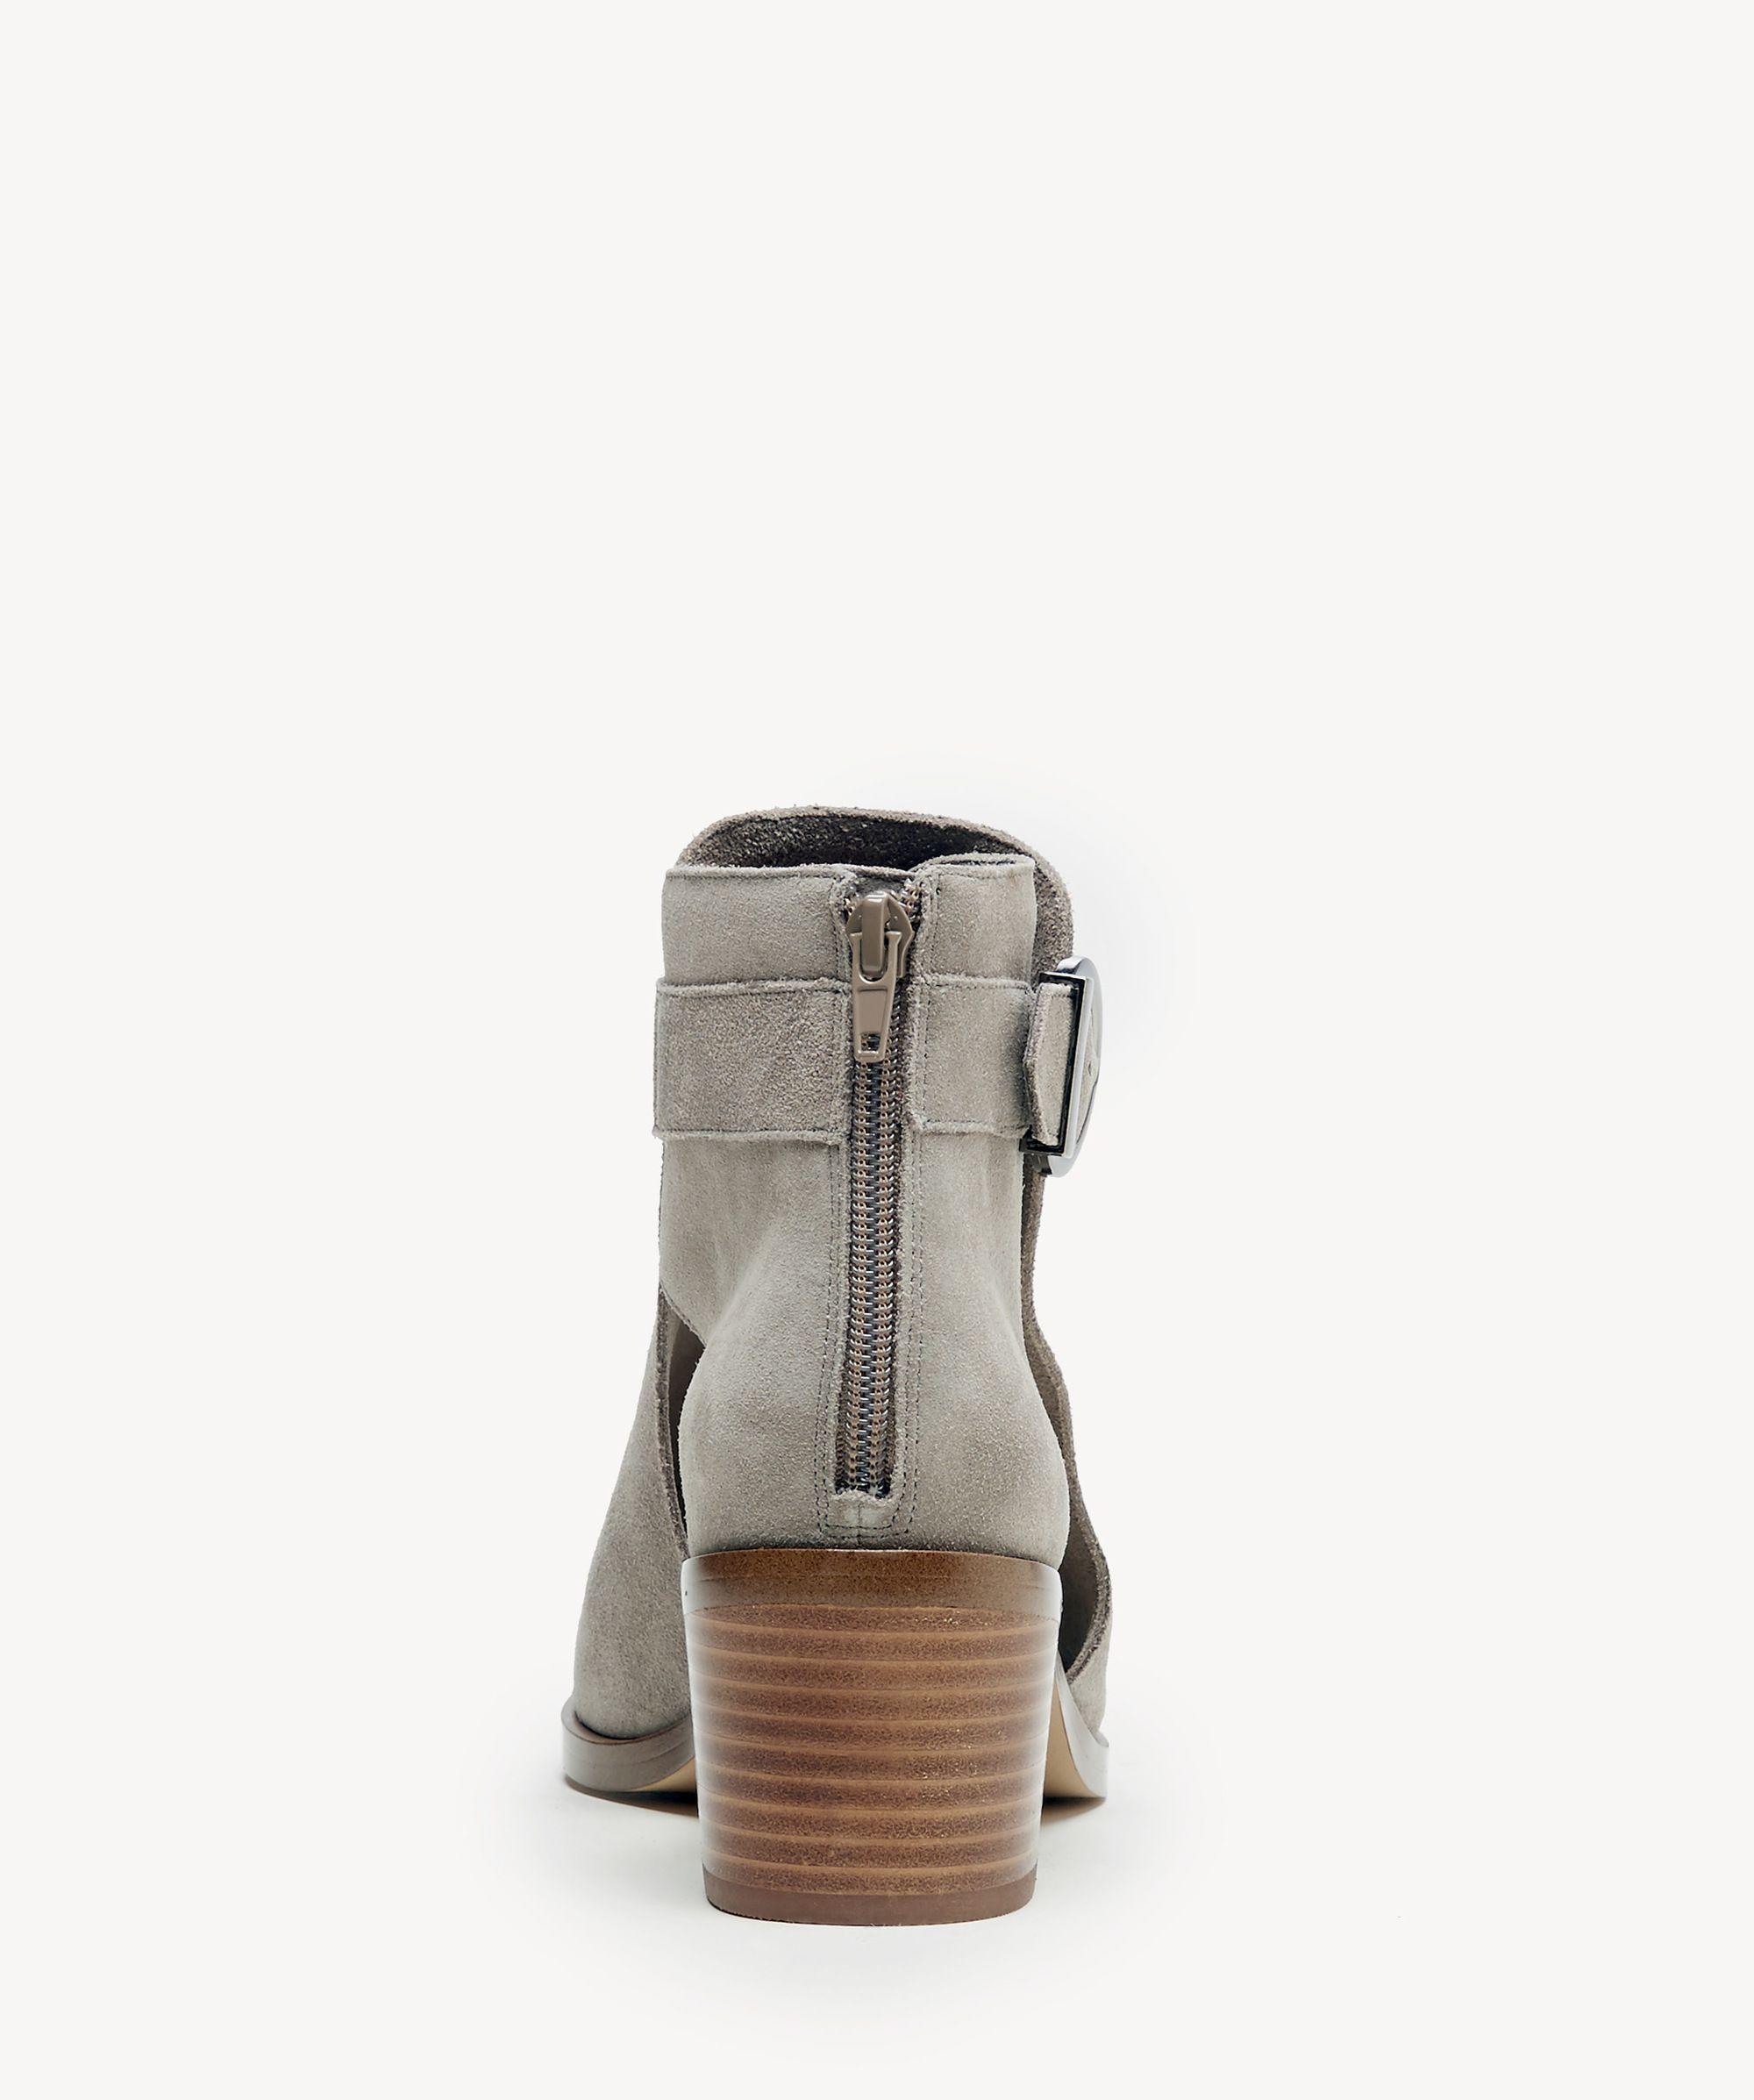 b697263ff132 Sole Society - Multicolor Tracy Block Heel Sandal - Lyst. View fullscreen